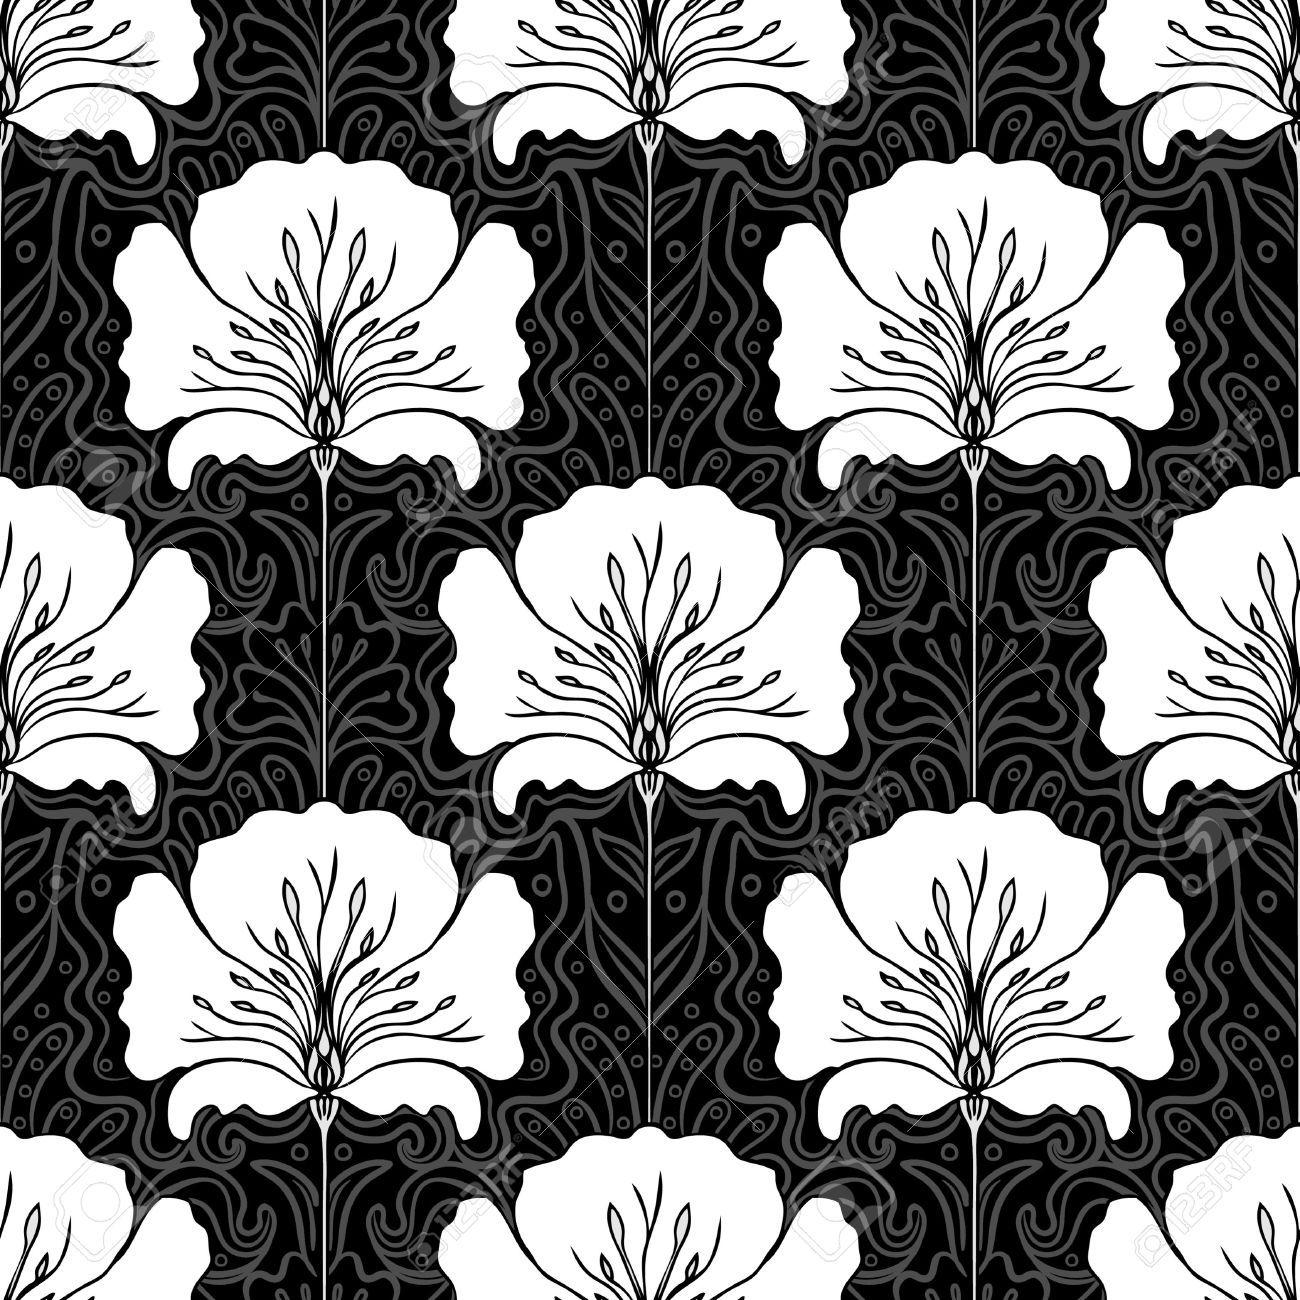 Related image art deco pattern textile pattern design art patterns pretty patterns